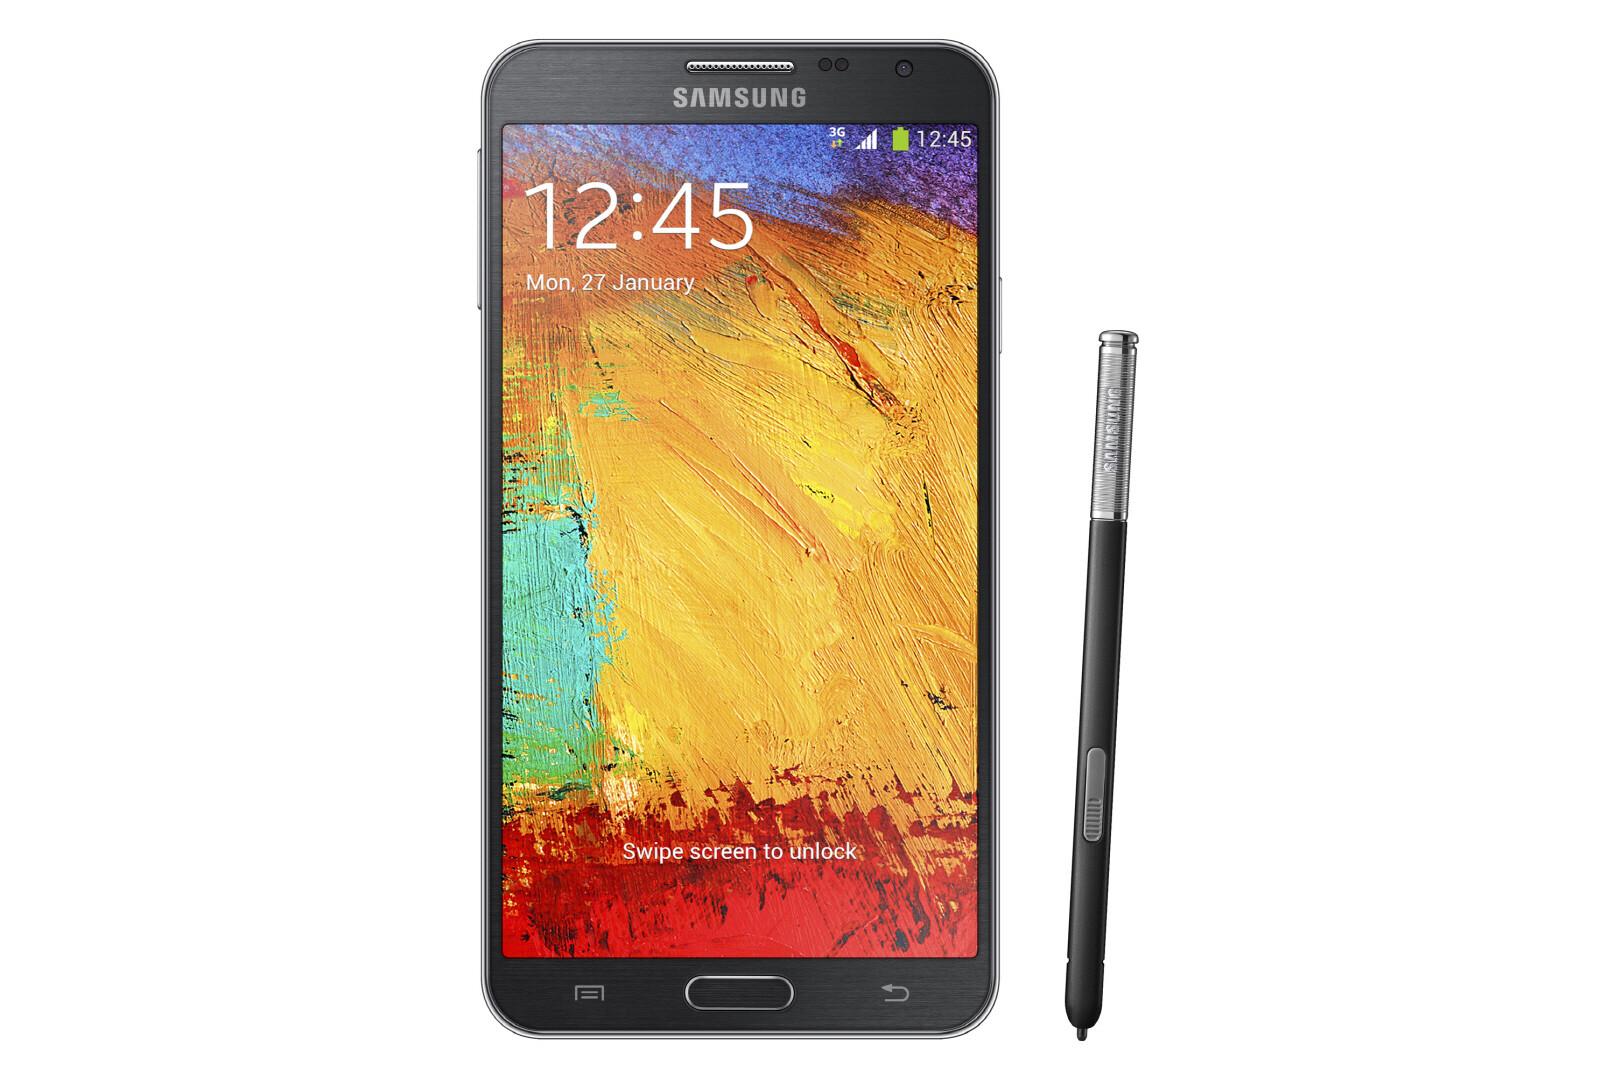 Samsung Galaxy Note 3 Neo vs Note 3 Samsung Galaxy Note 3 Neo